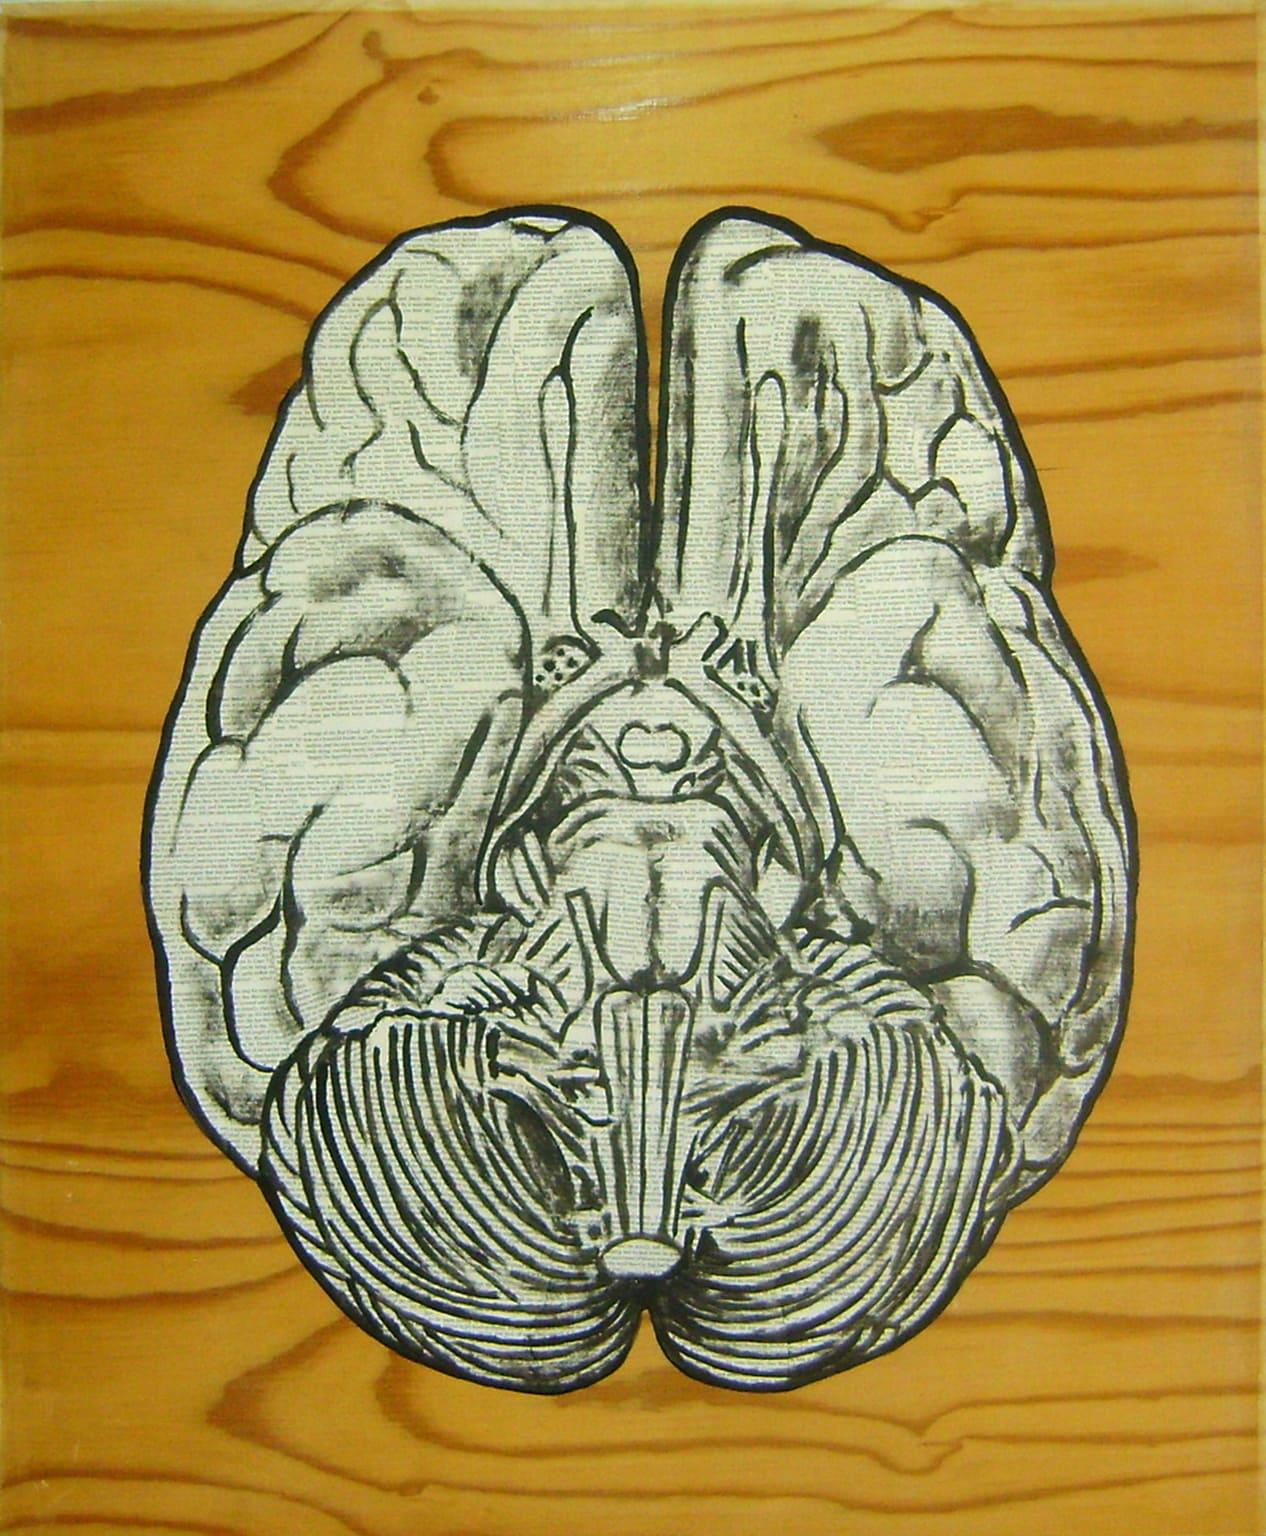 <span class=&#34;link fancybox-details-link&#34;><a href=&#34;/artists/73-sascha-%26-tashi-stylianou/works/3178-sascha-tashi-stylianou-brain-two-2015/&#34;>View Detail Page</a></span><div class=&#34;artist&#34;><strong>Sascha & Tashi Stylianou</strong></div> <div class=&#34;title&#34;><em>Brain Two</em>, 2015</div> <div class=&#34;medium&#34;>Mixed Media On Reclaimed Pressed Pine </div> <div class=&#34;dimensions&#34;>100cm x 122cm</div><div class=&#34;price&#34;>R8,000.00</div>